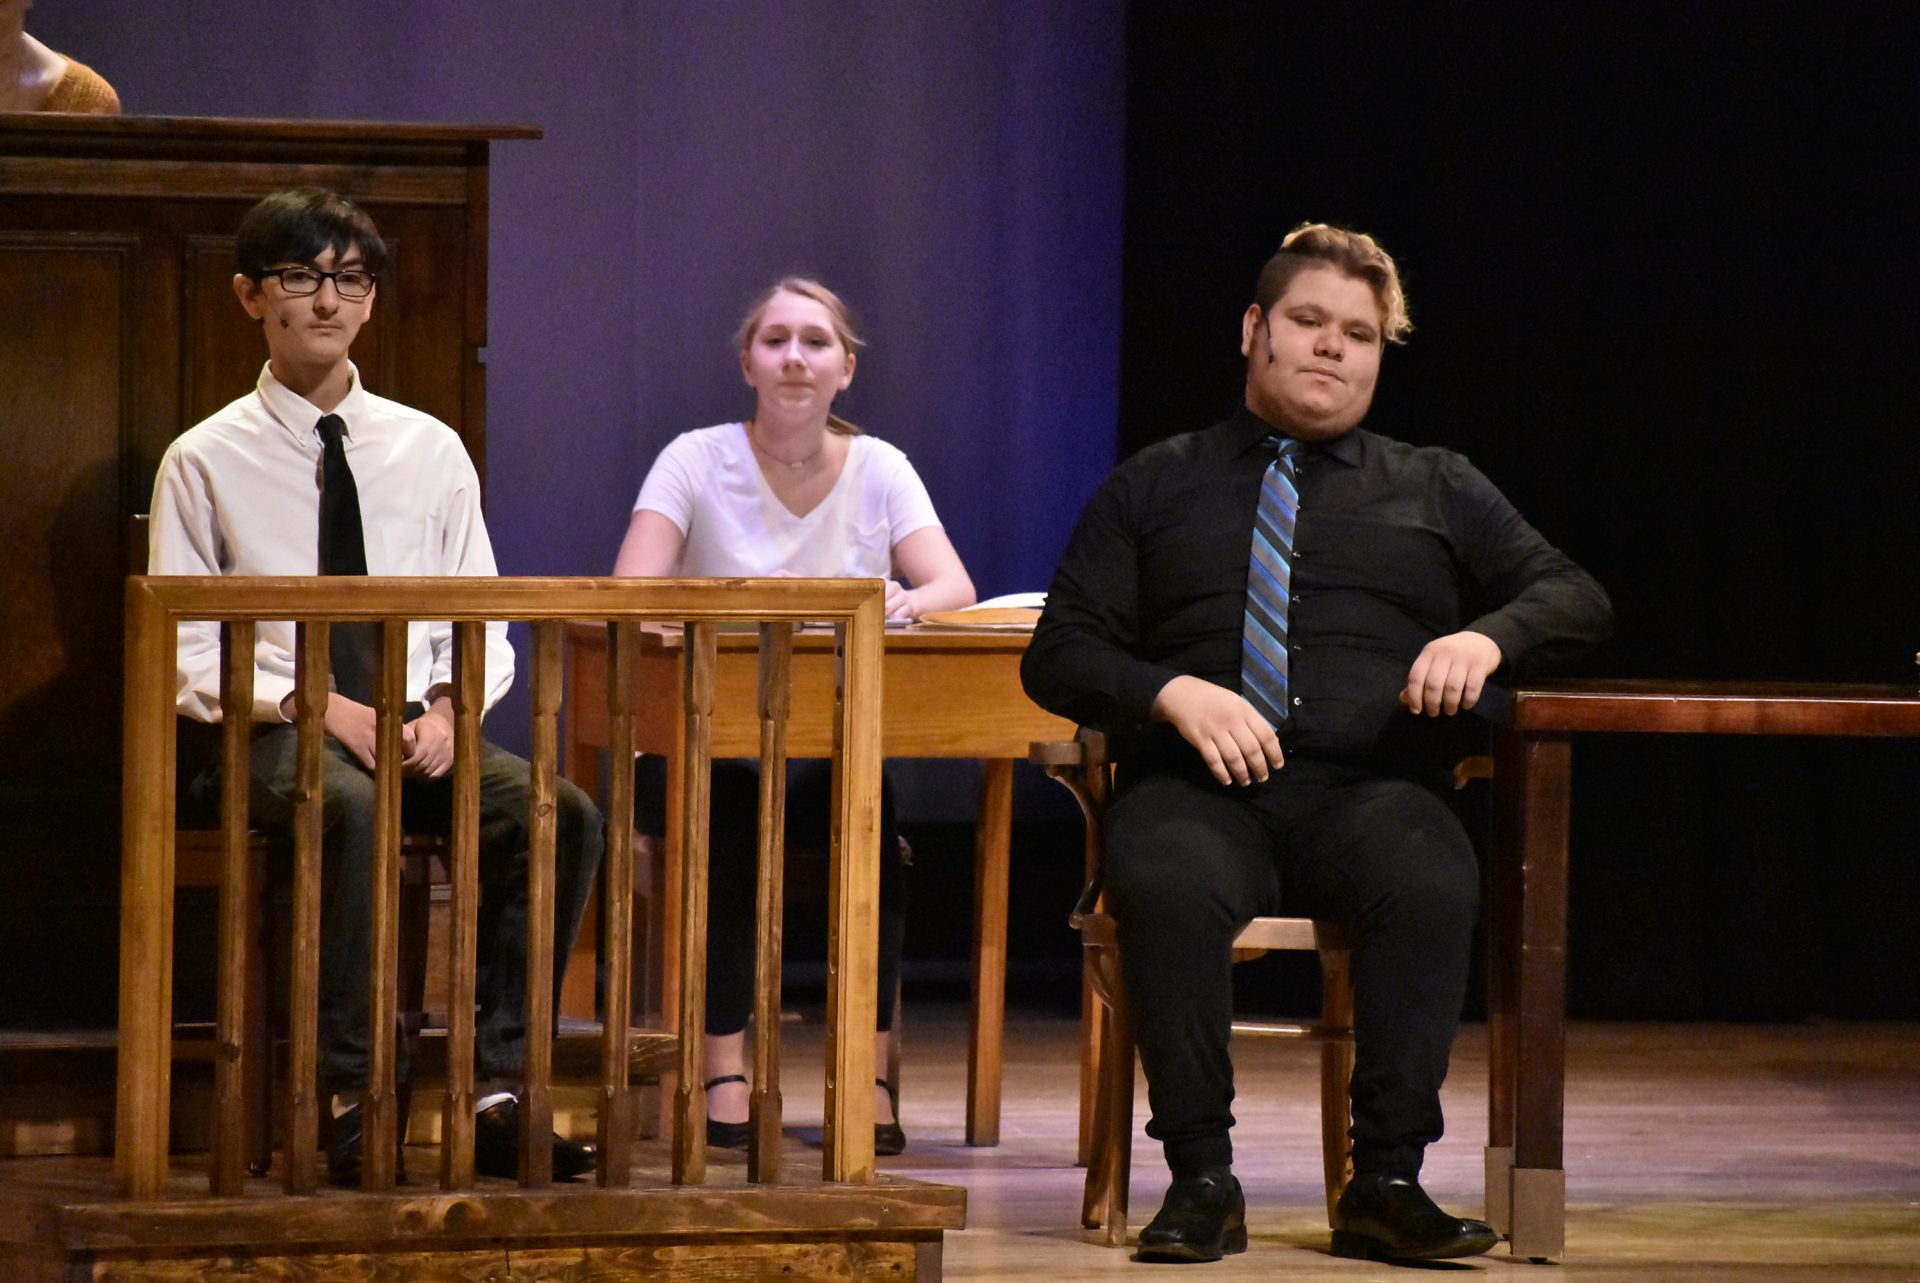 VTTC Actors on Stage acting upset